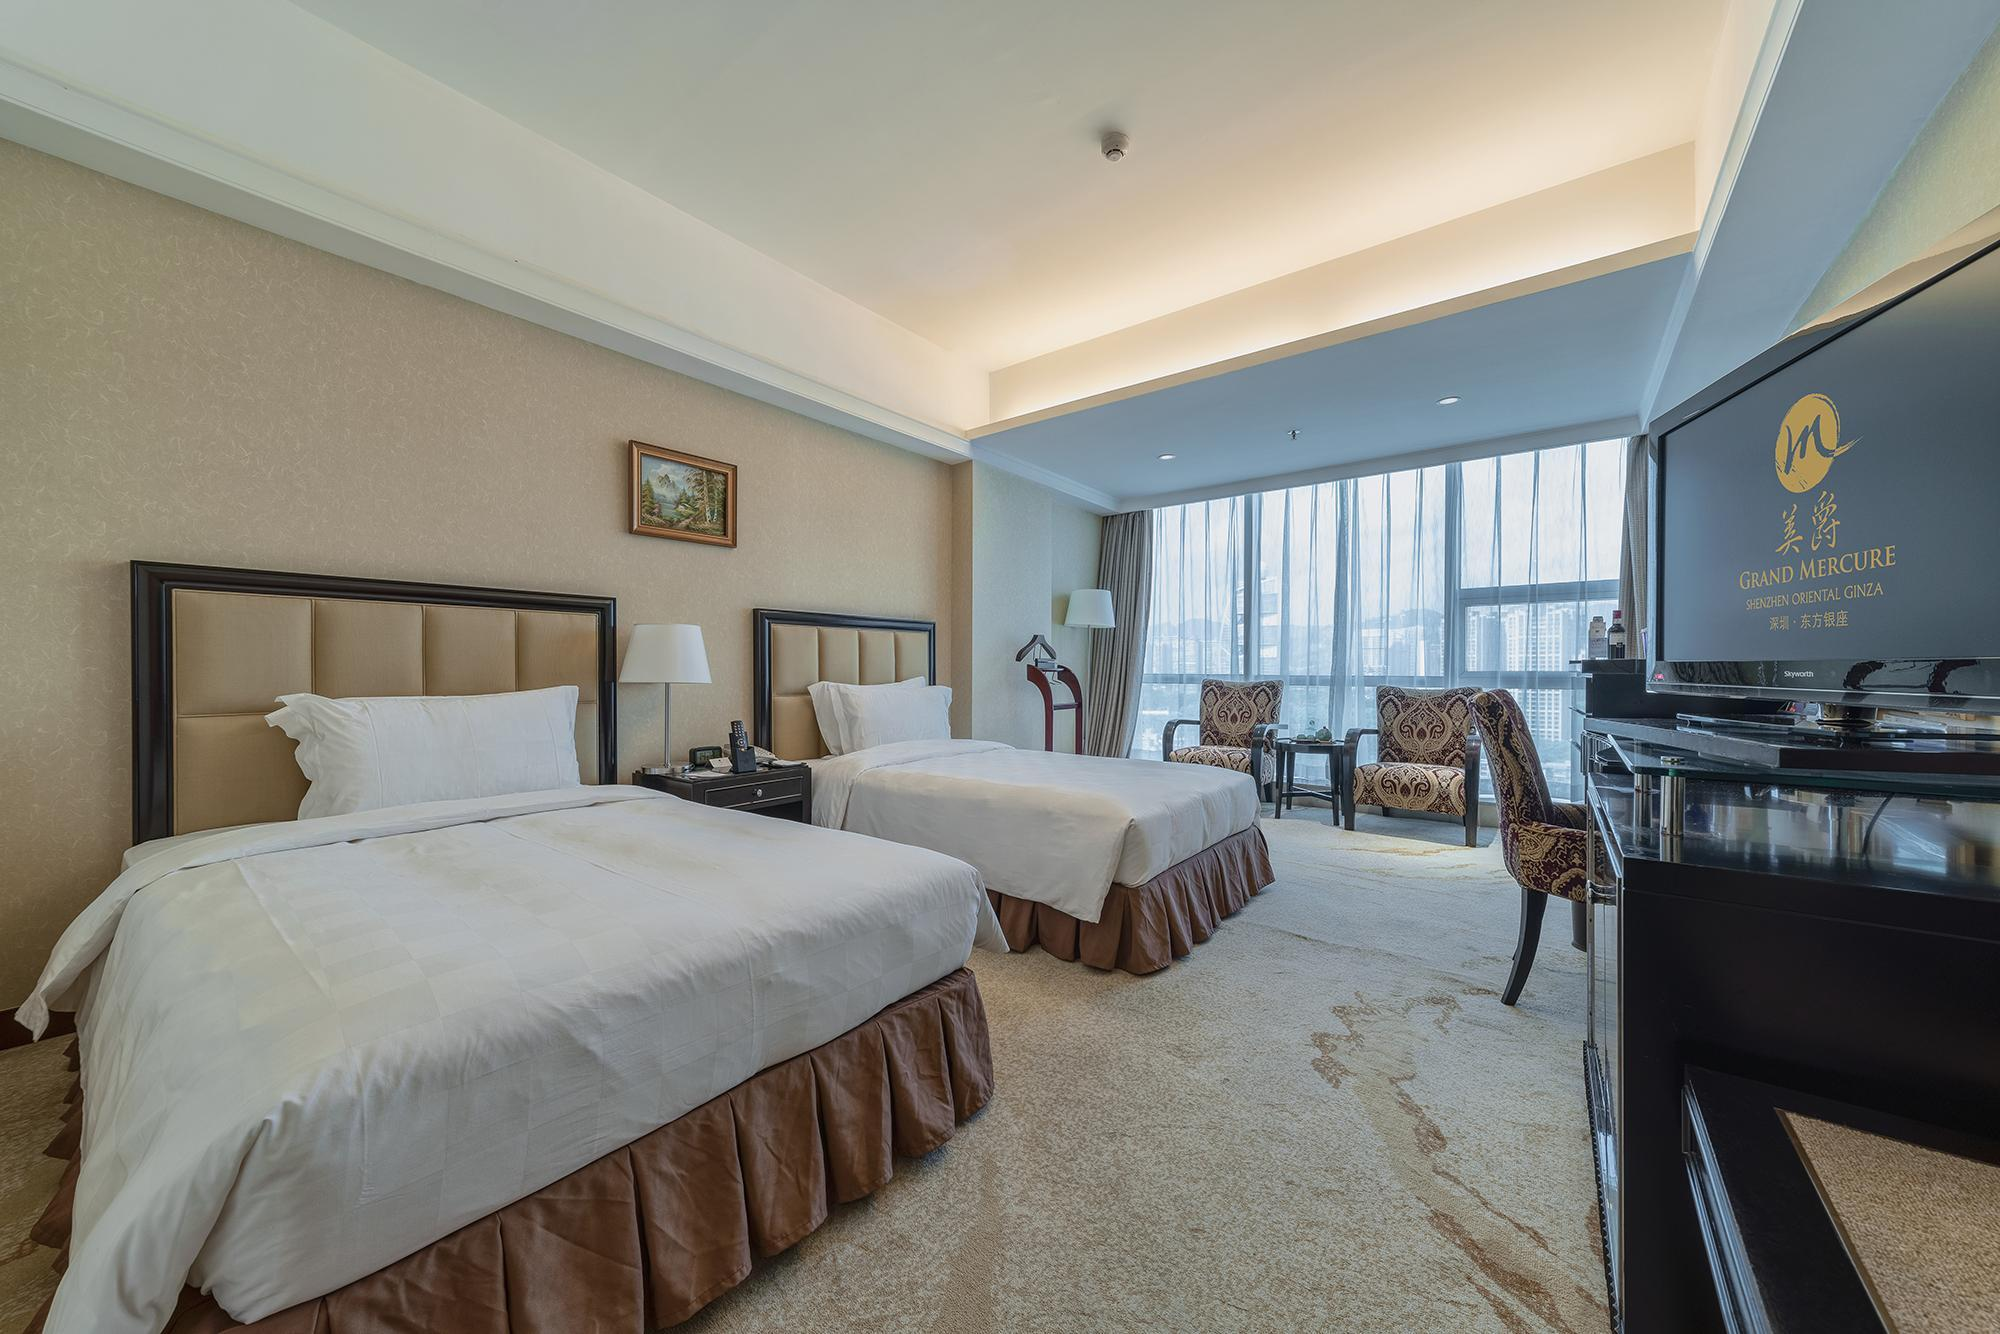 Grand Mercure Oriental Ginza Hotel, Shenzhen